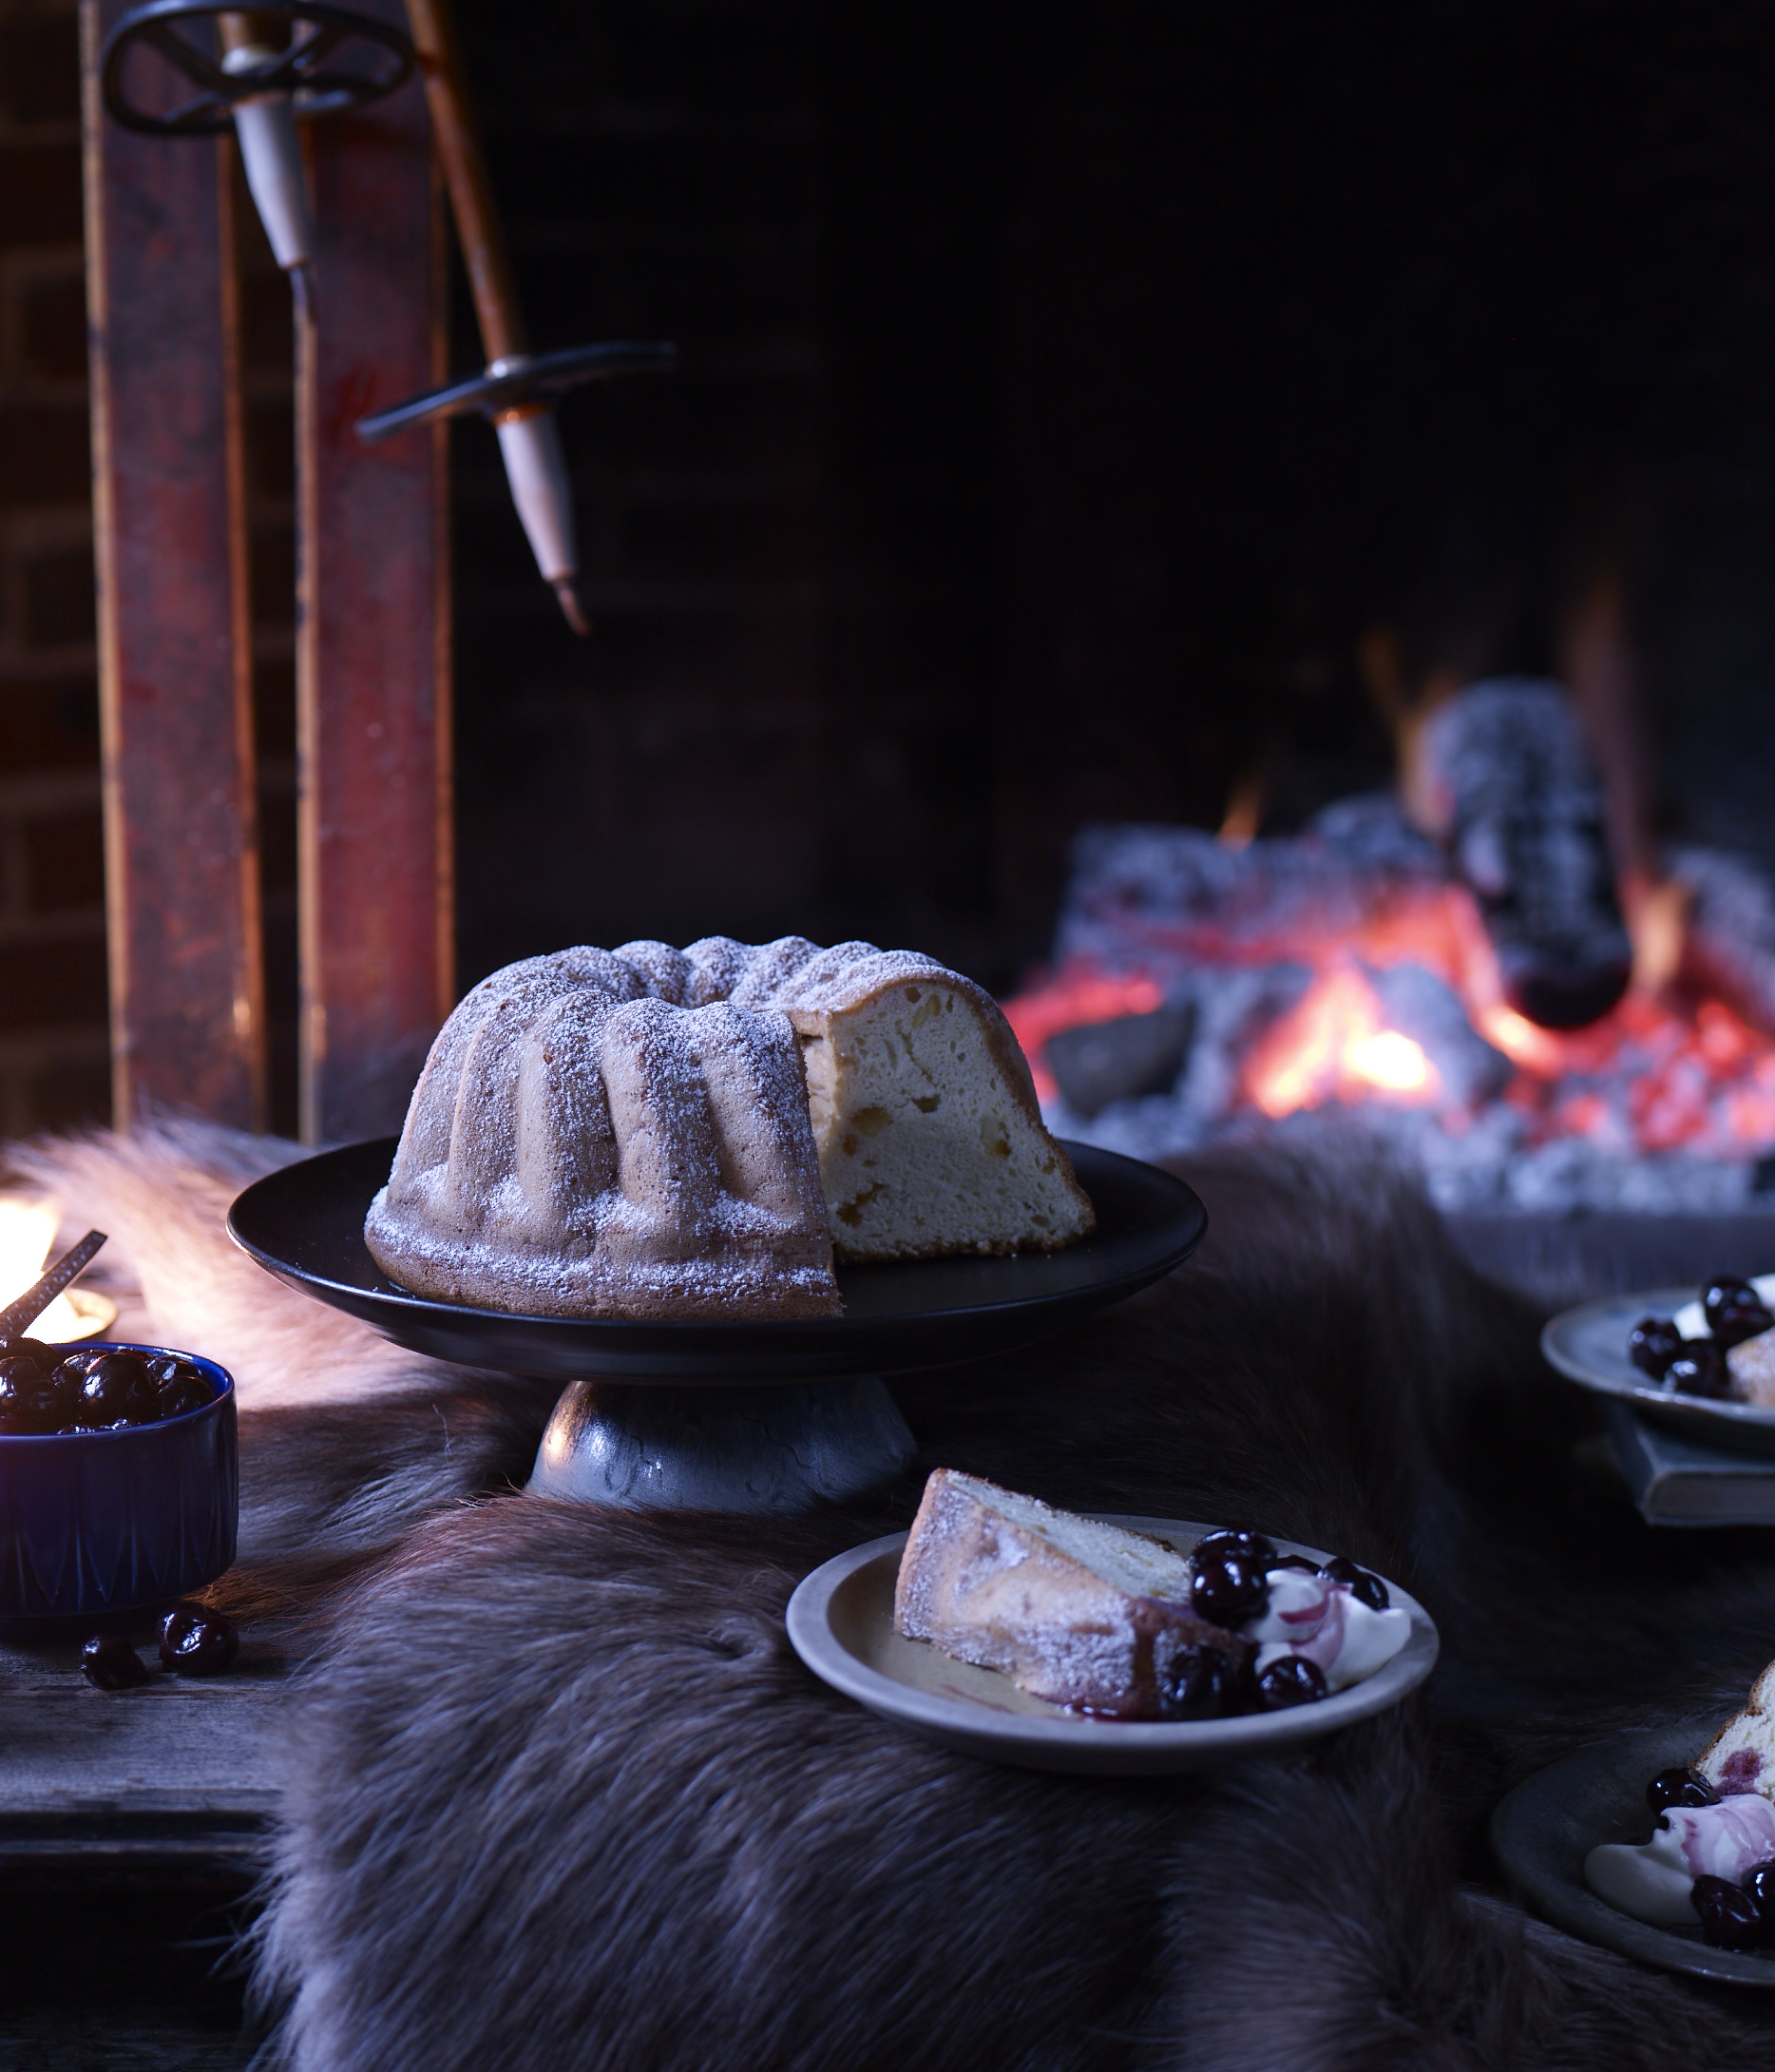 Winter_Cabin_Book_D6_1_GateauSavoie_118.jpg